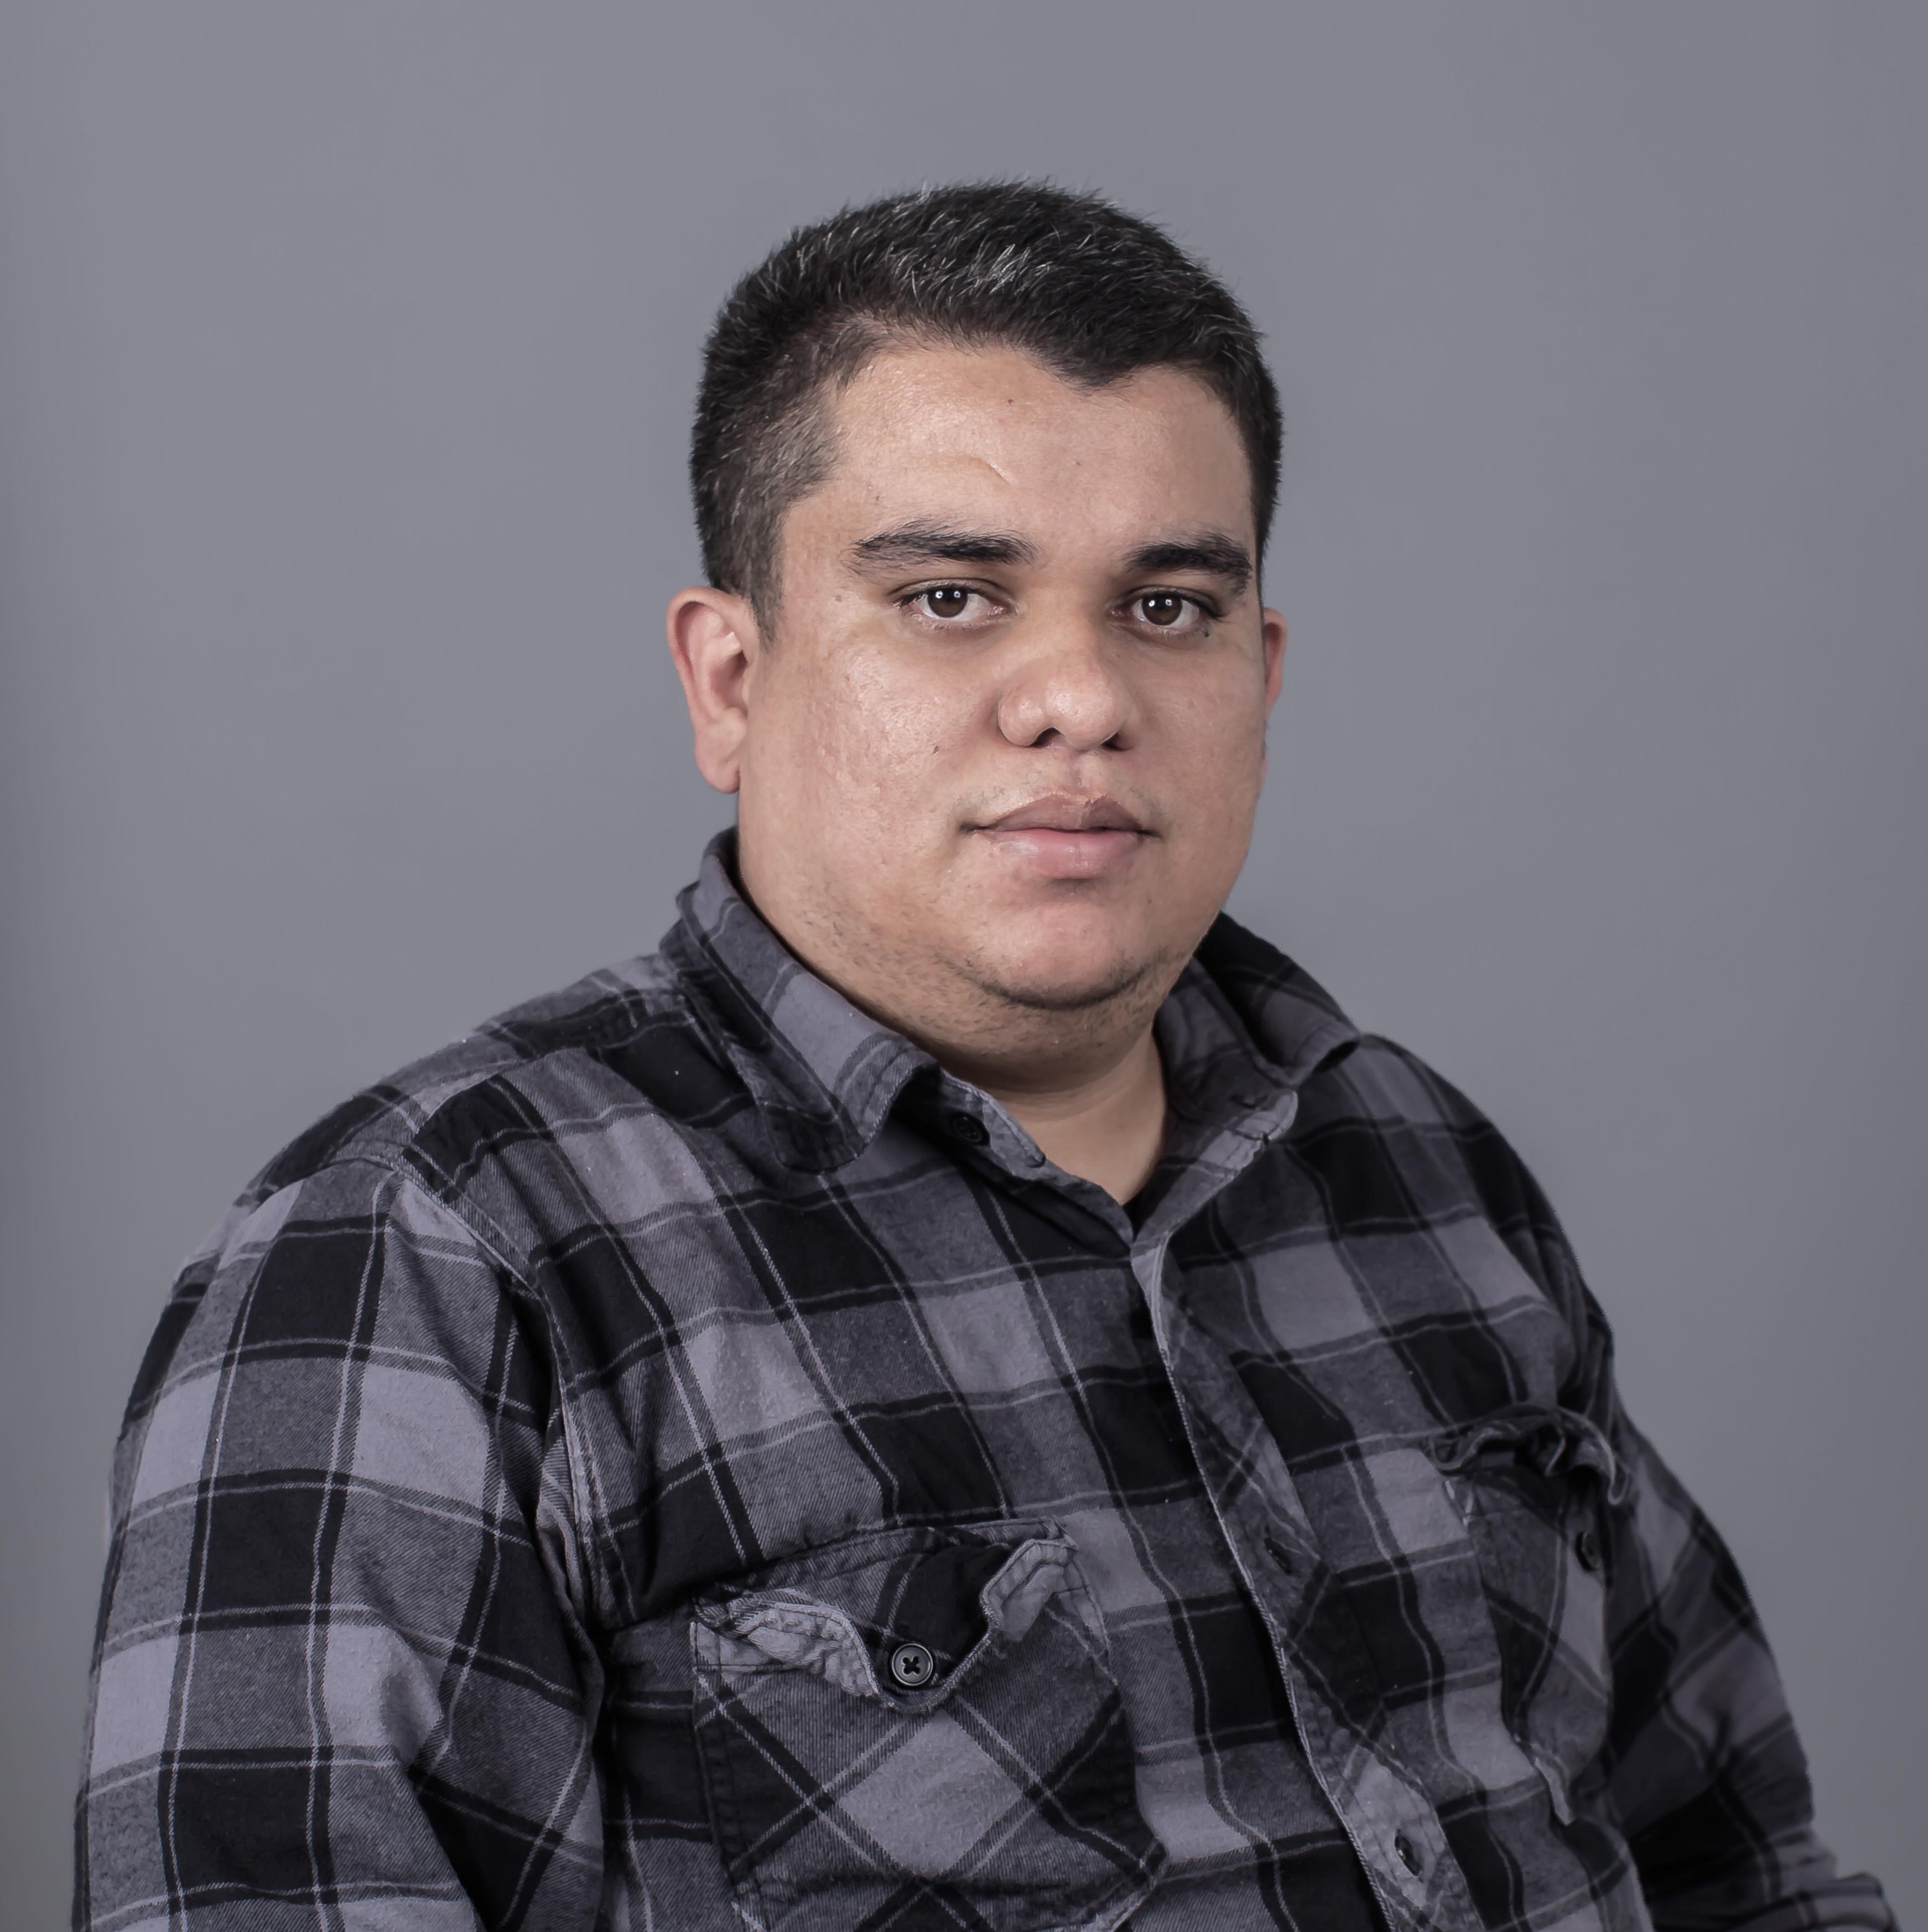 Manuel Arce